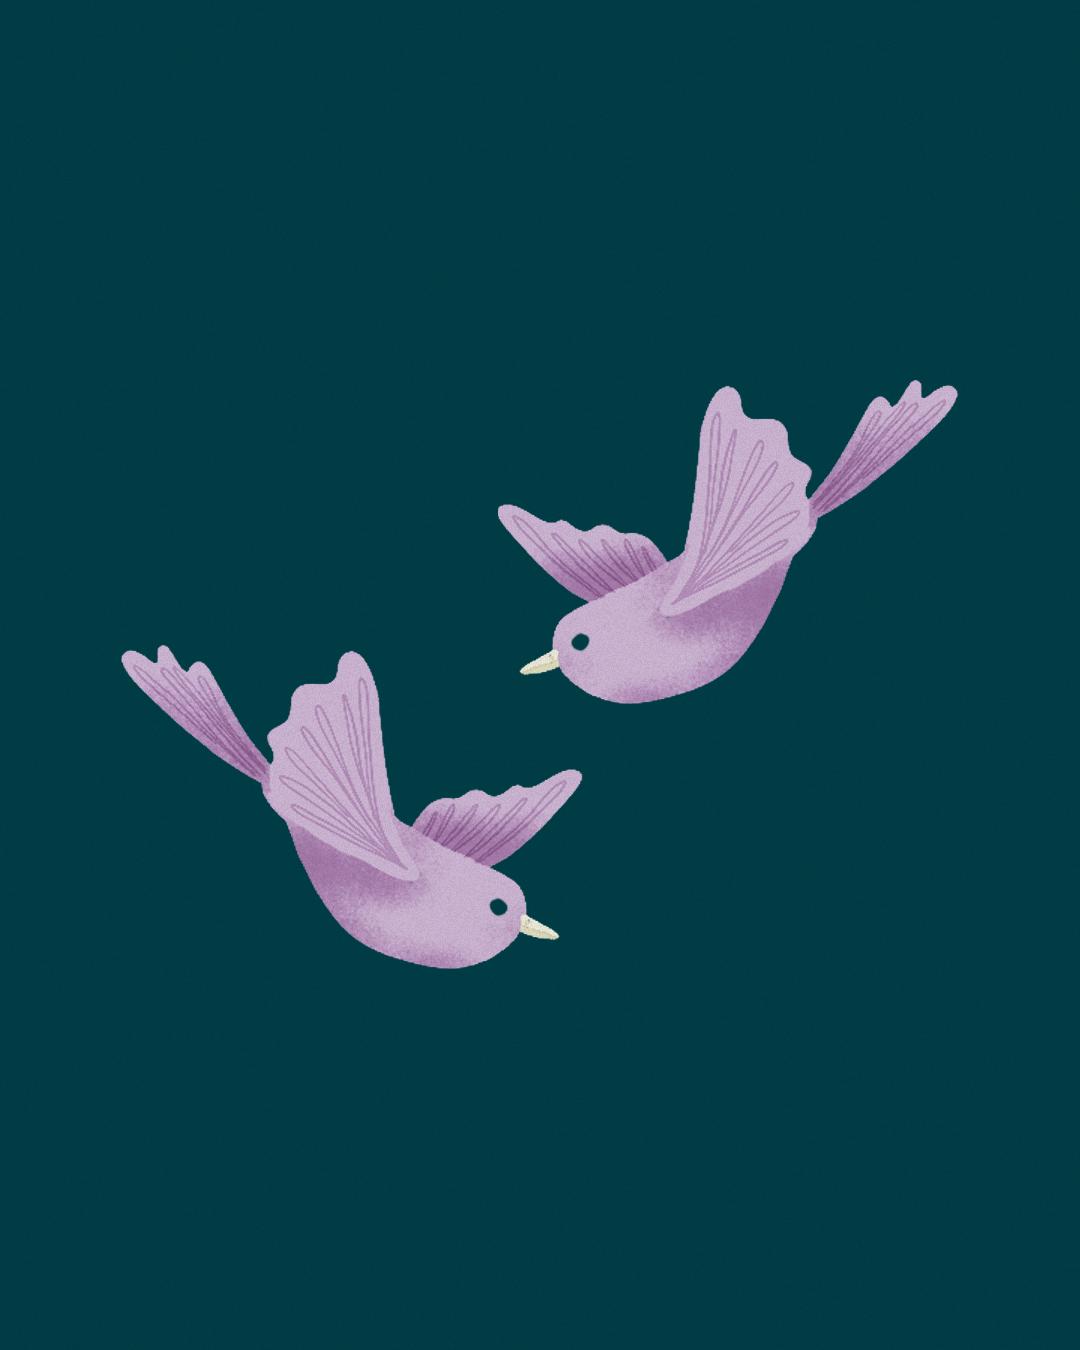 Cover illustration for Judy Spencer's 'The Girl in the Birdbath'